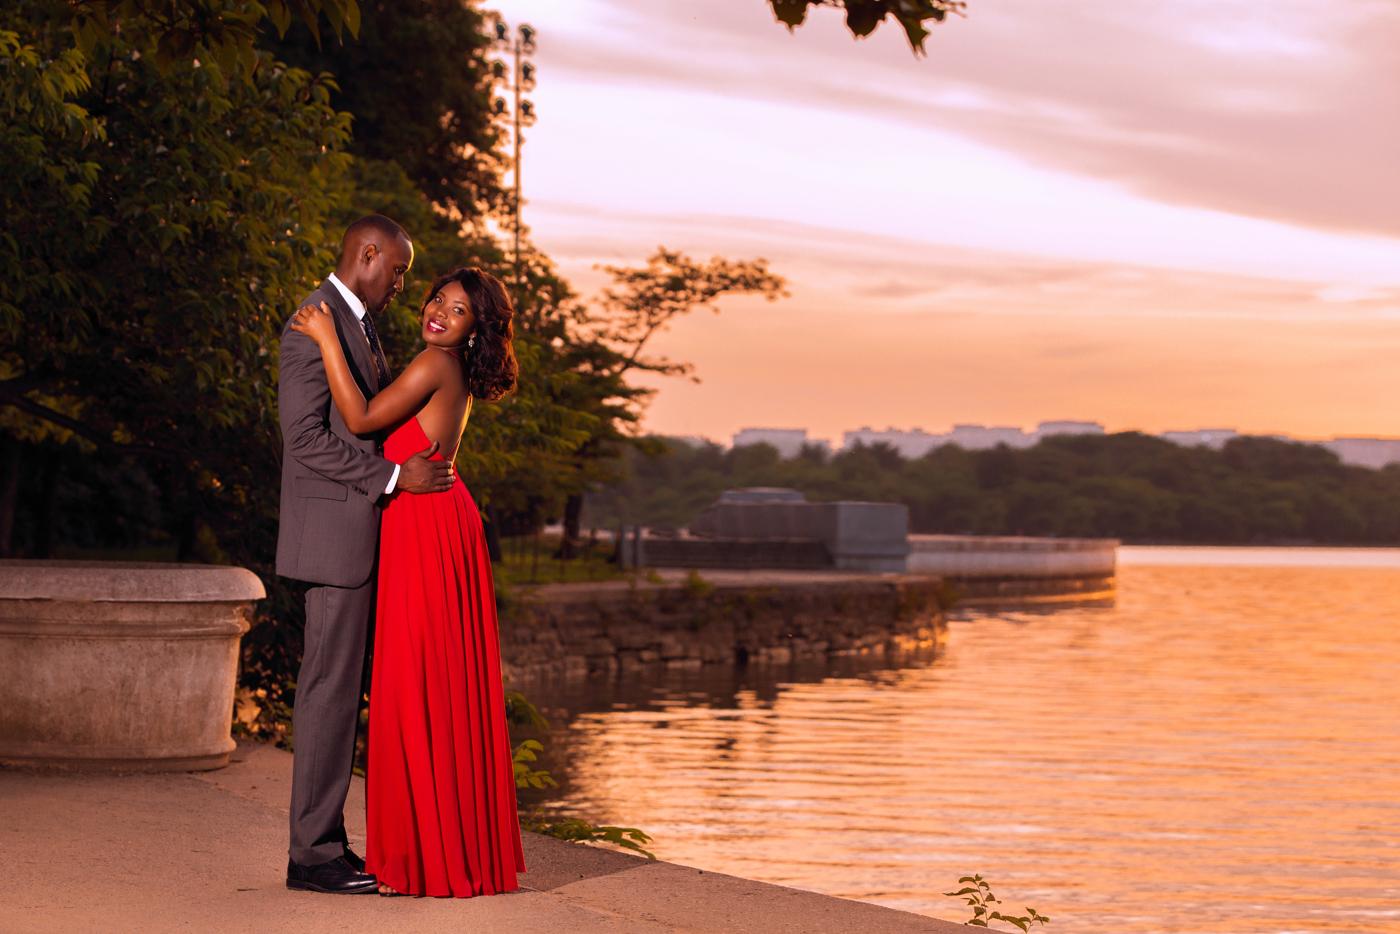 Jessica-Daniel-Engagement-Photo-Shoot-in-the-heart-of-Washington-DC-Ksenia-Pro-Photography-11